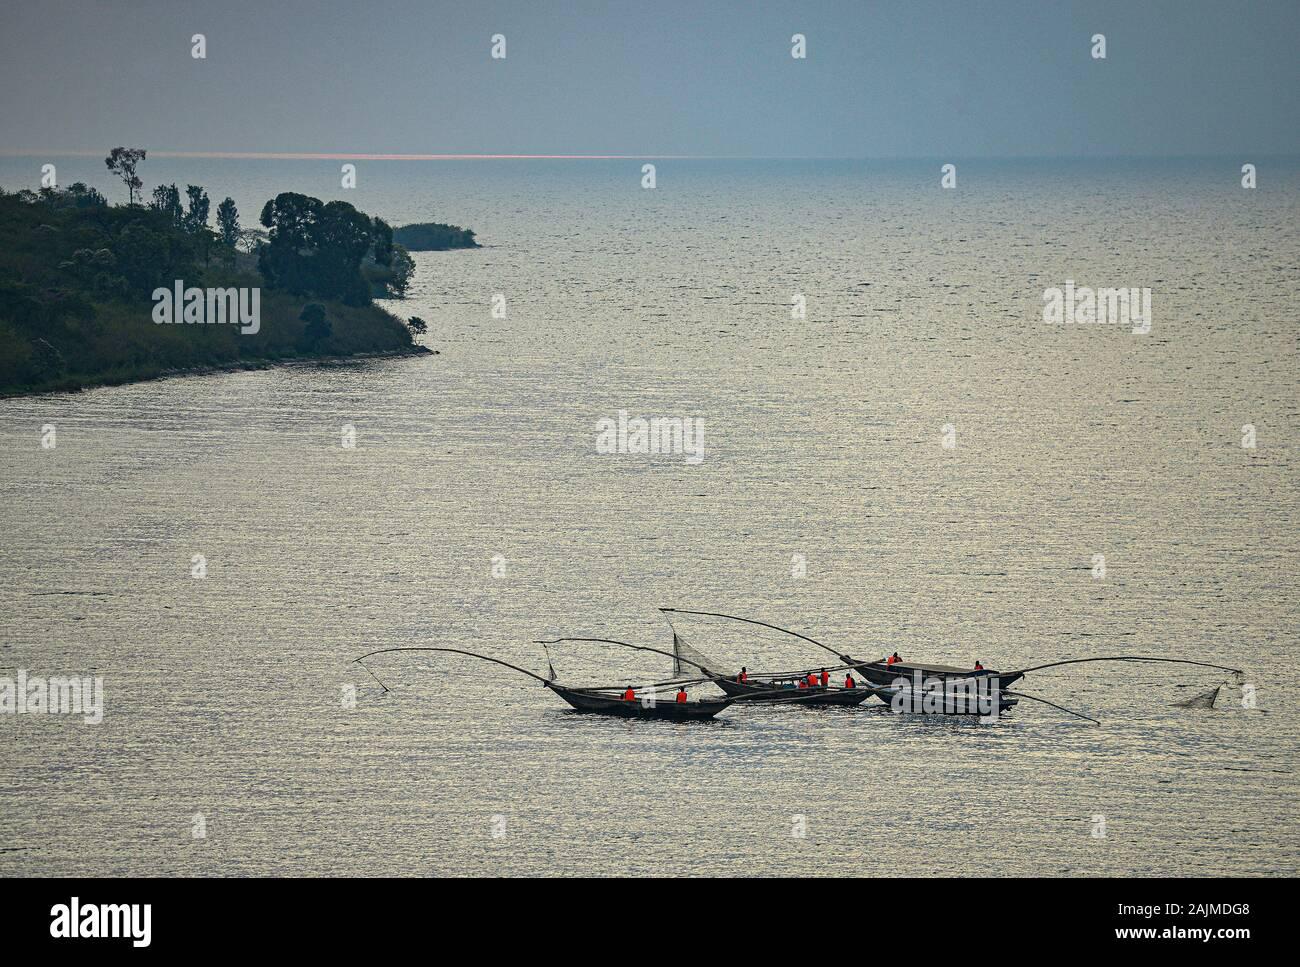 Fishing Canoes on the Lake with the Sun's Reflection on Water. Lake Kivu, Rwanda. Lake Kivu is shared by Rwanda and the Democratic Republic of Congo. Stock Photo